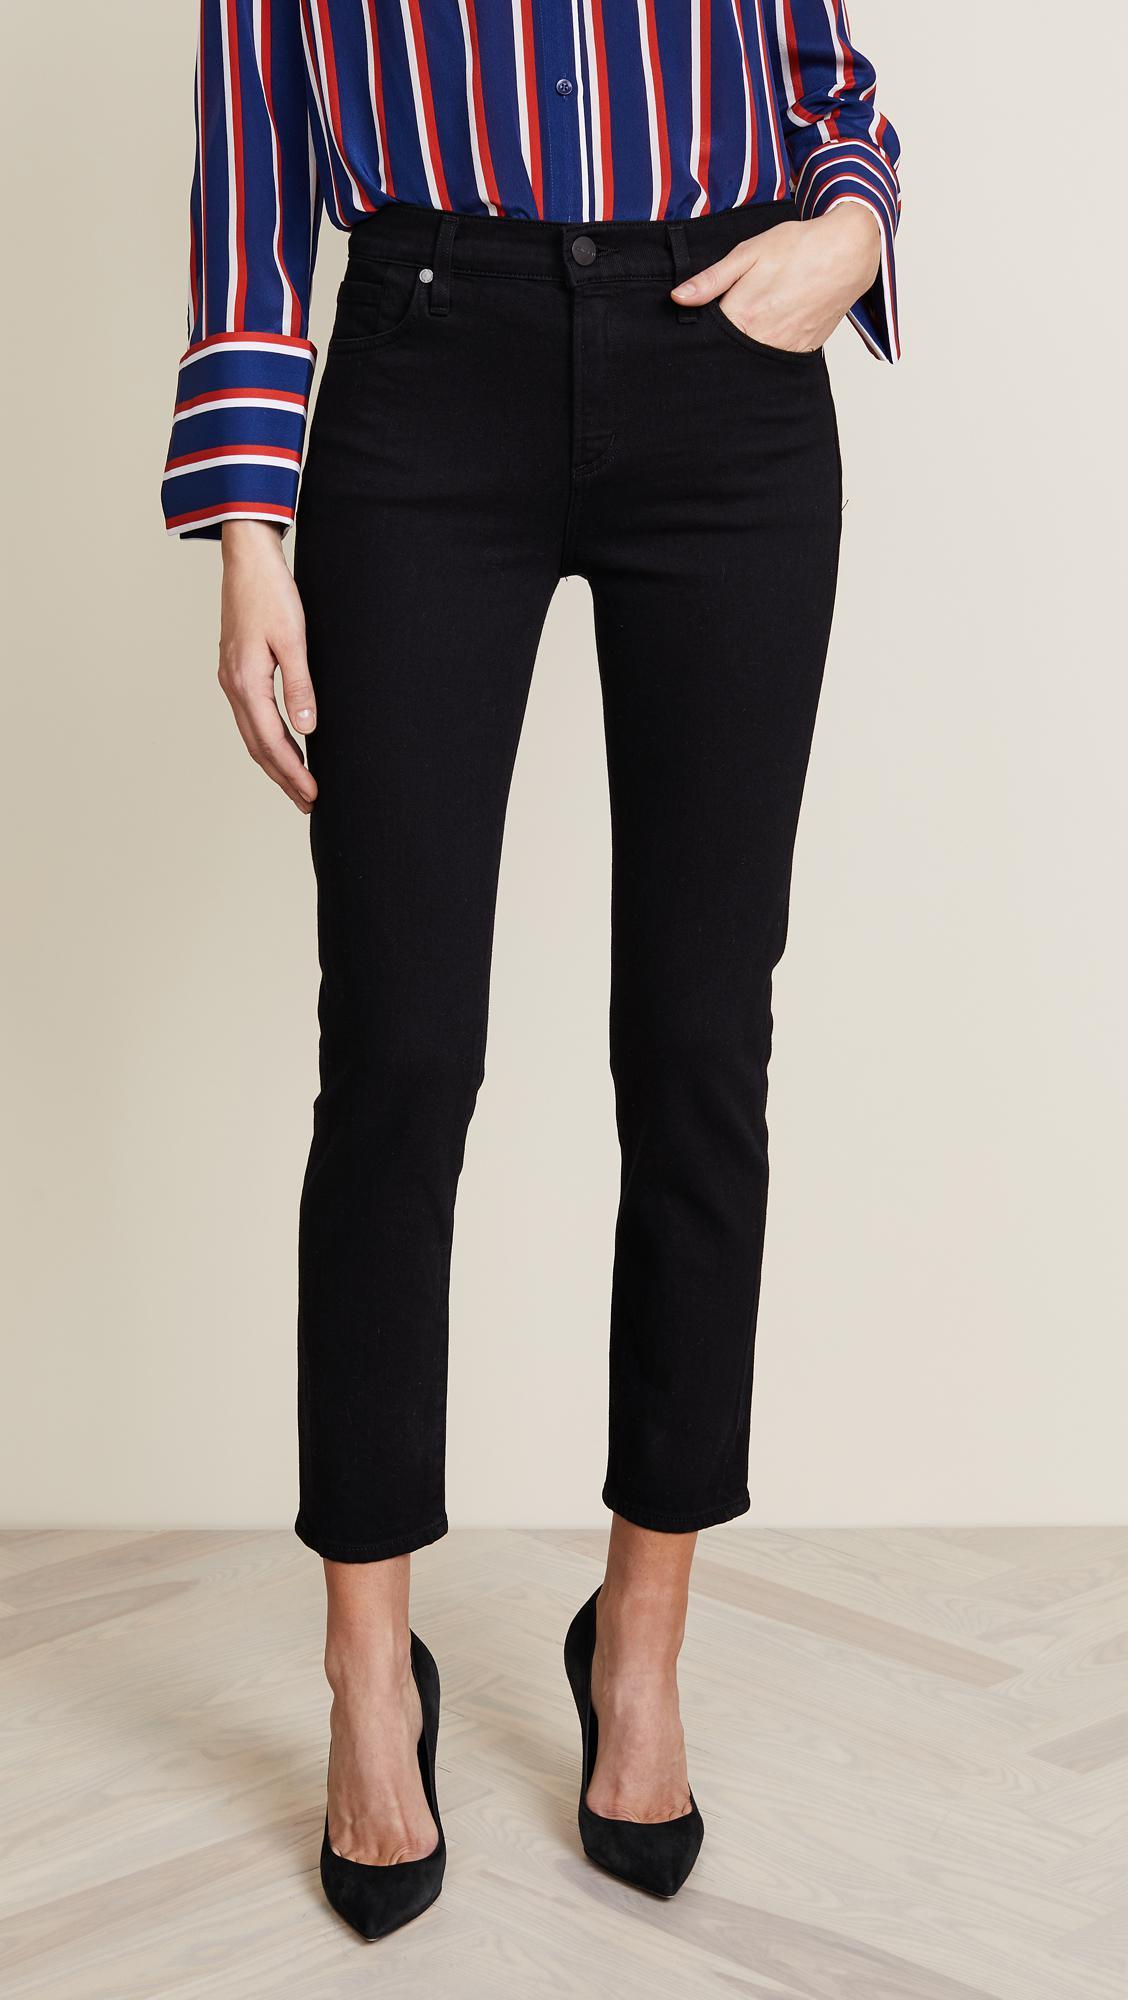 lyst goldsign the semi fit slim straight jeans. Black Bedroom Furniture Sets. Home Design Ideas